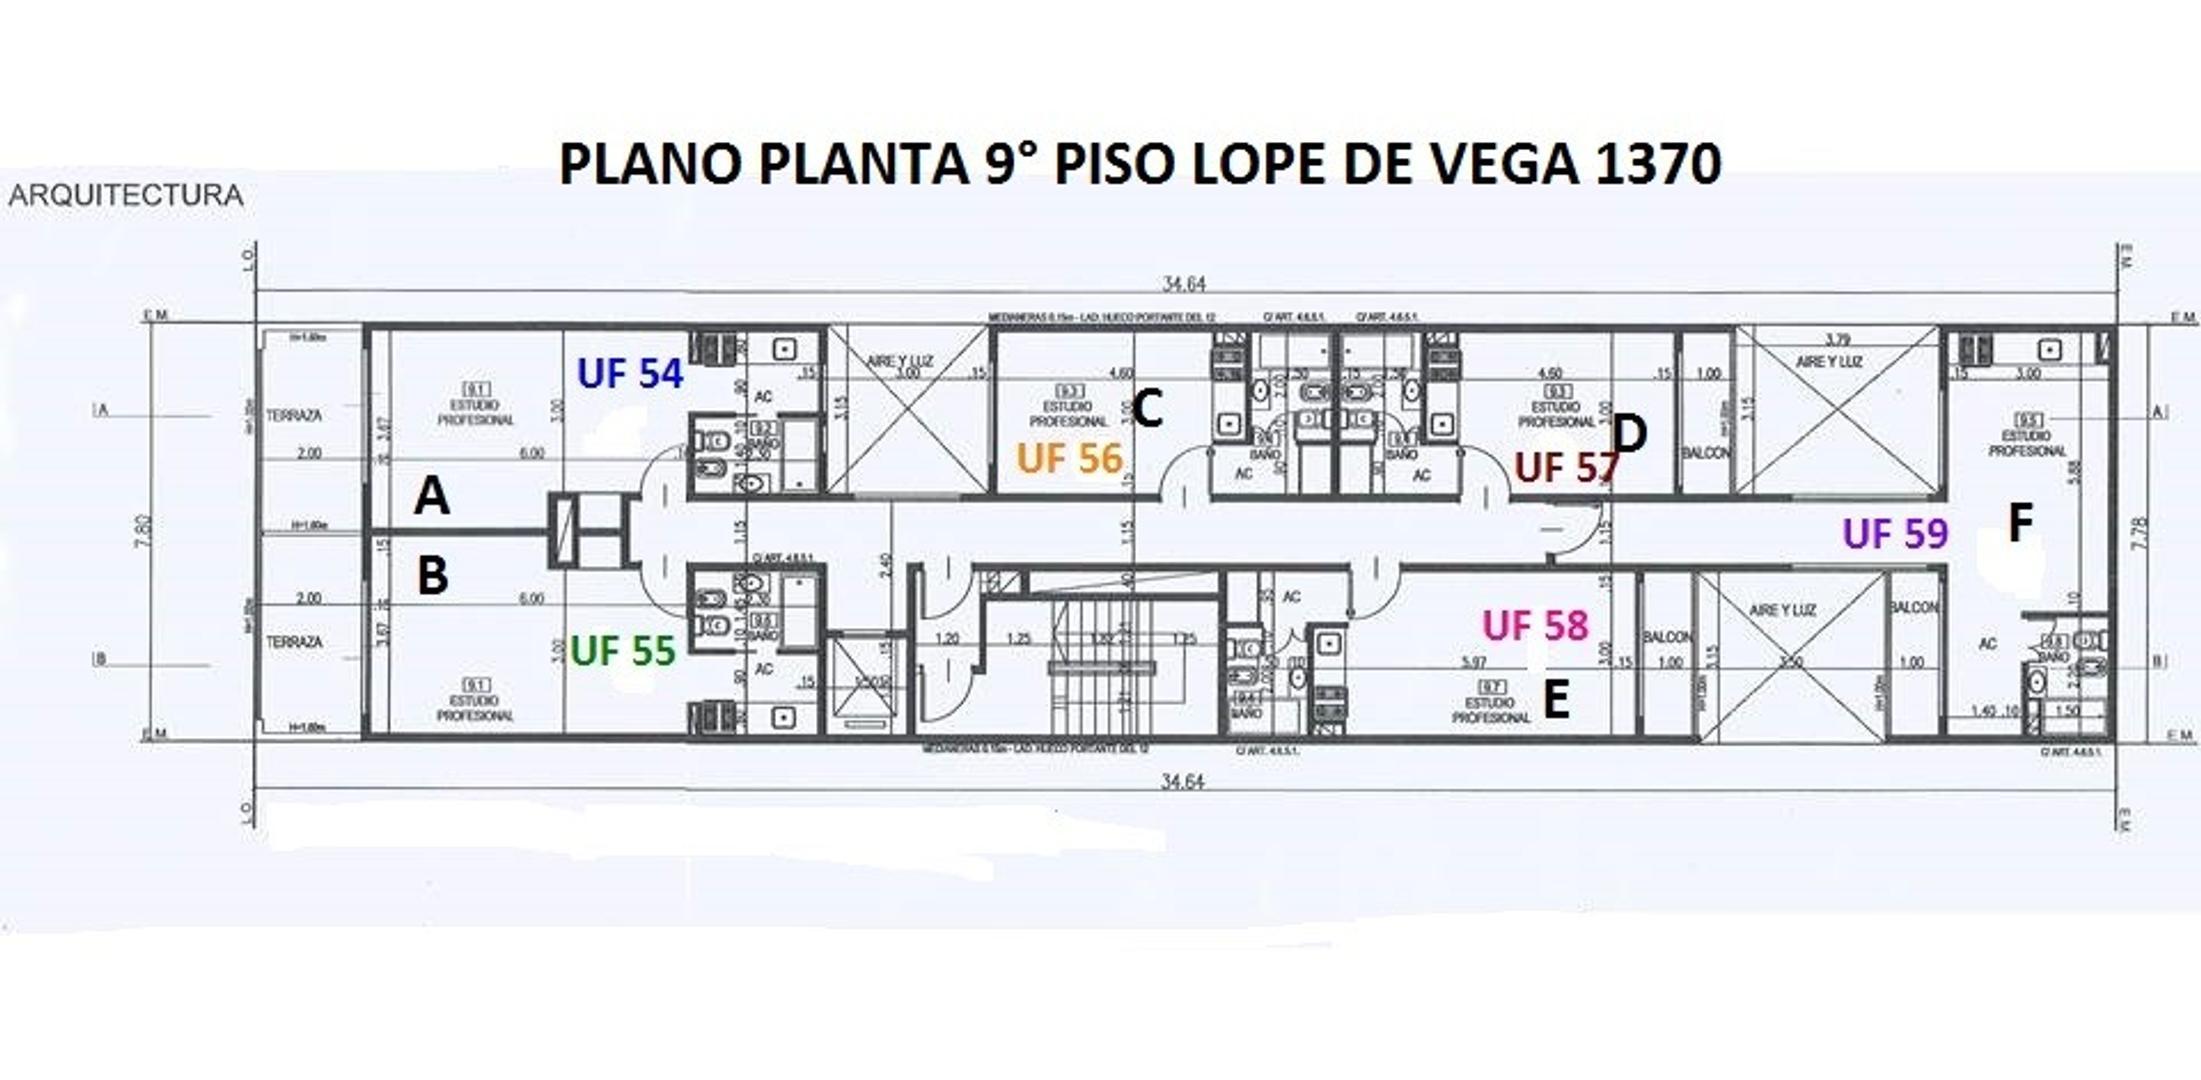 XINTEL(NIR-NIR-1023) Departamento - Venta - Argentina, Capital Federal - AV. LOPE DE VEGA  AL 1300